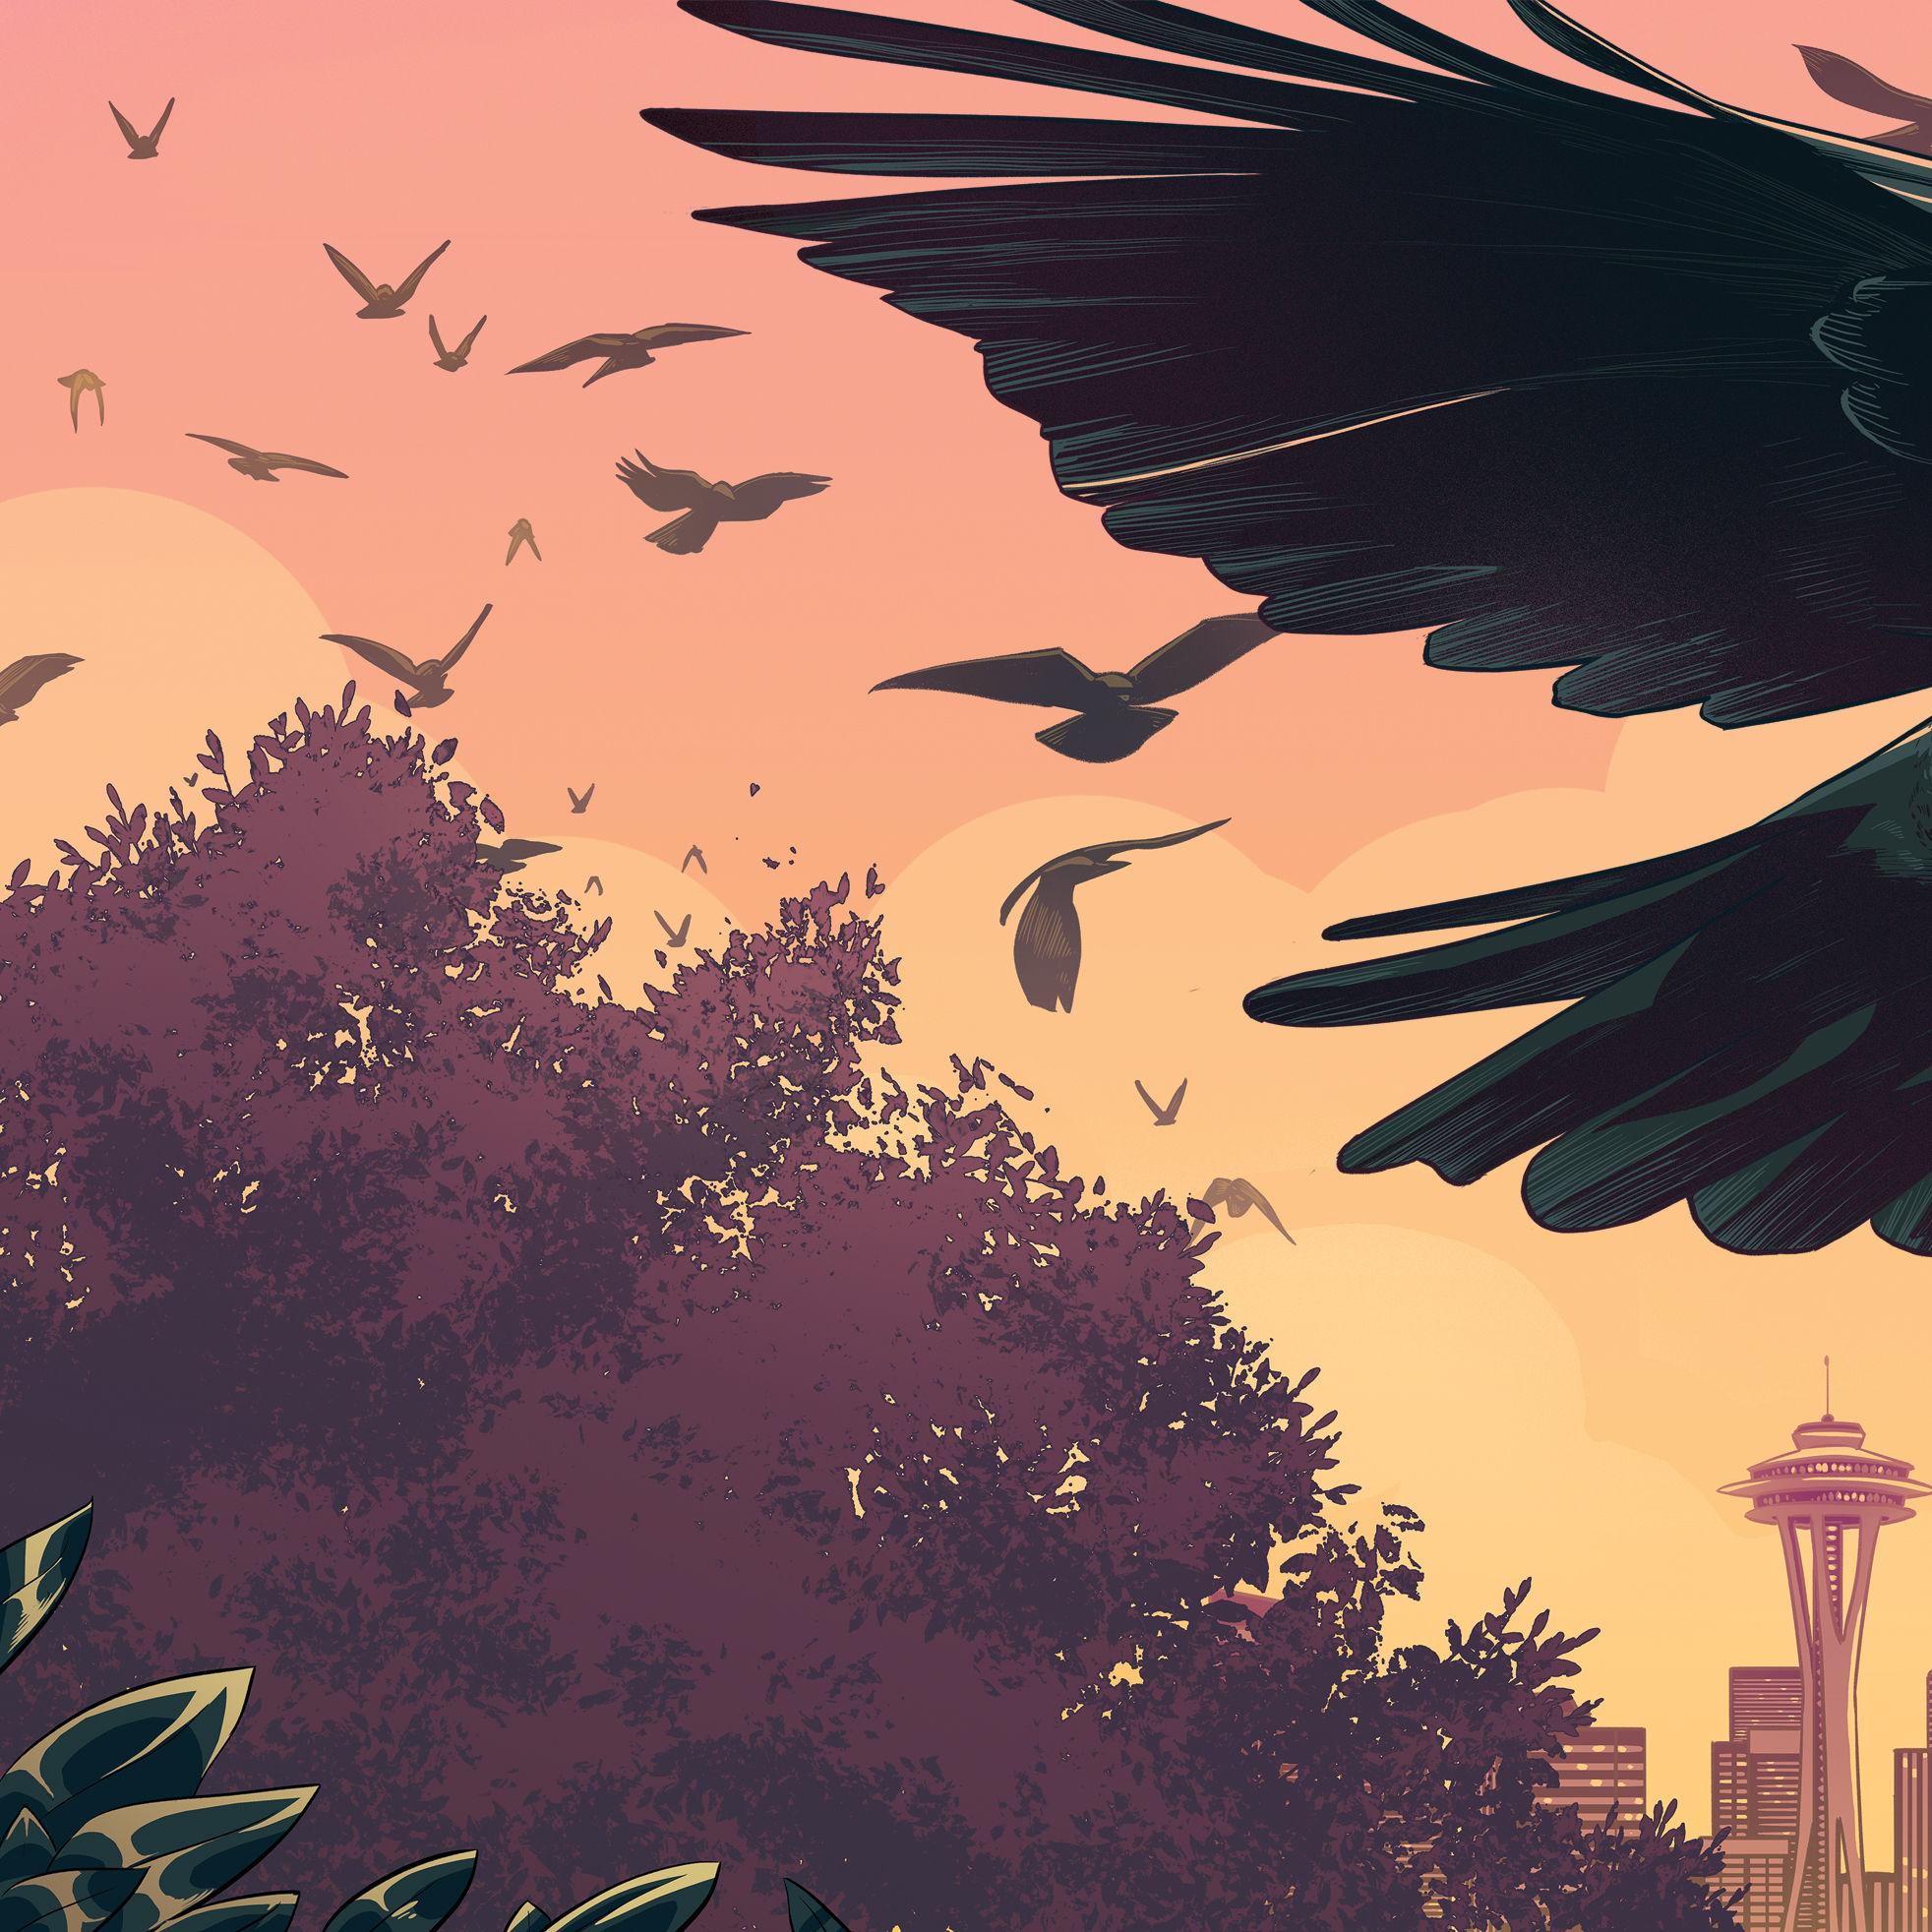 Crows zz1rl1